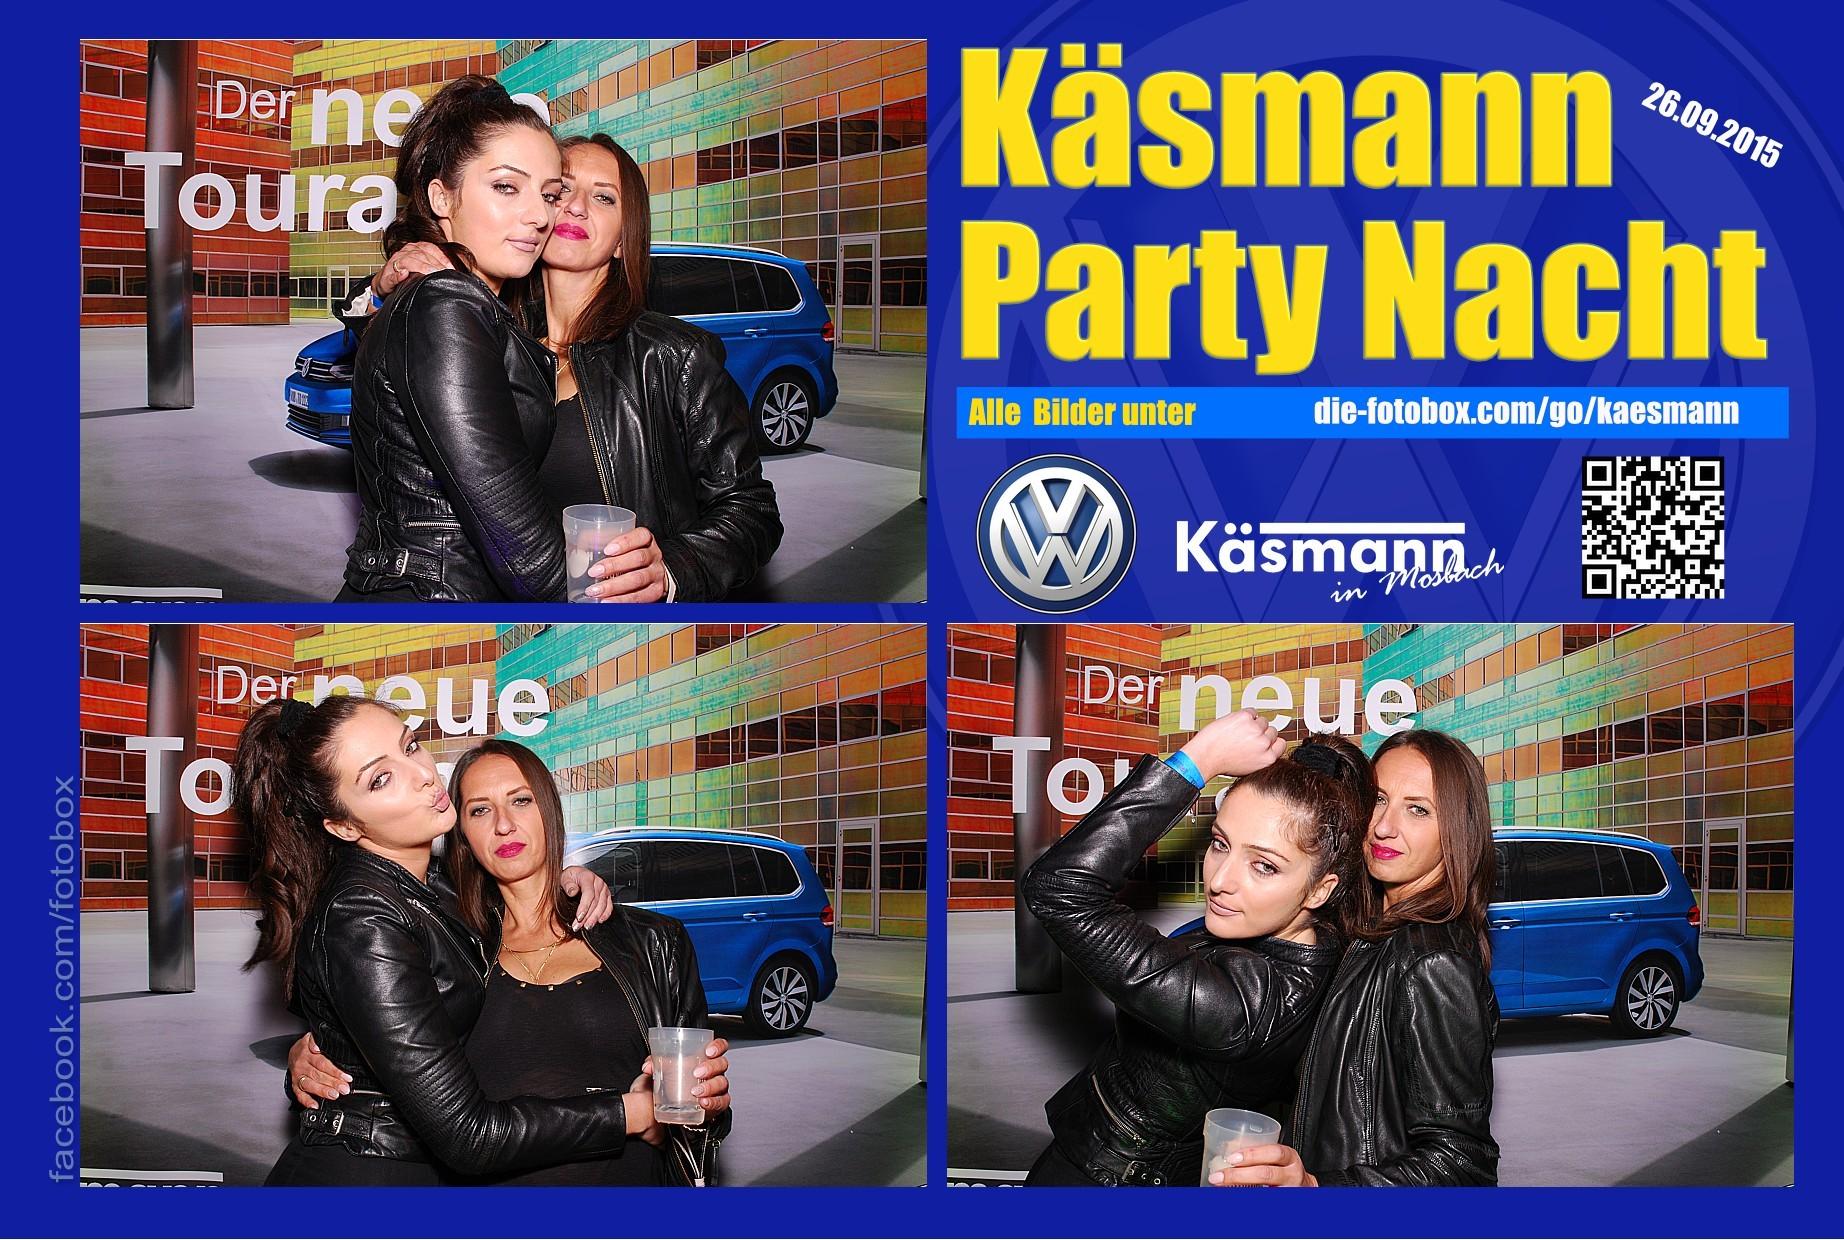 Käsmannparty 2015 - www.die-fotobox.com 01076